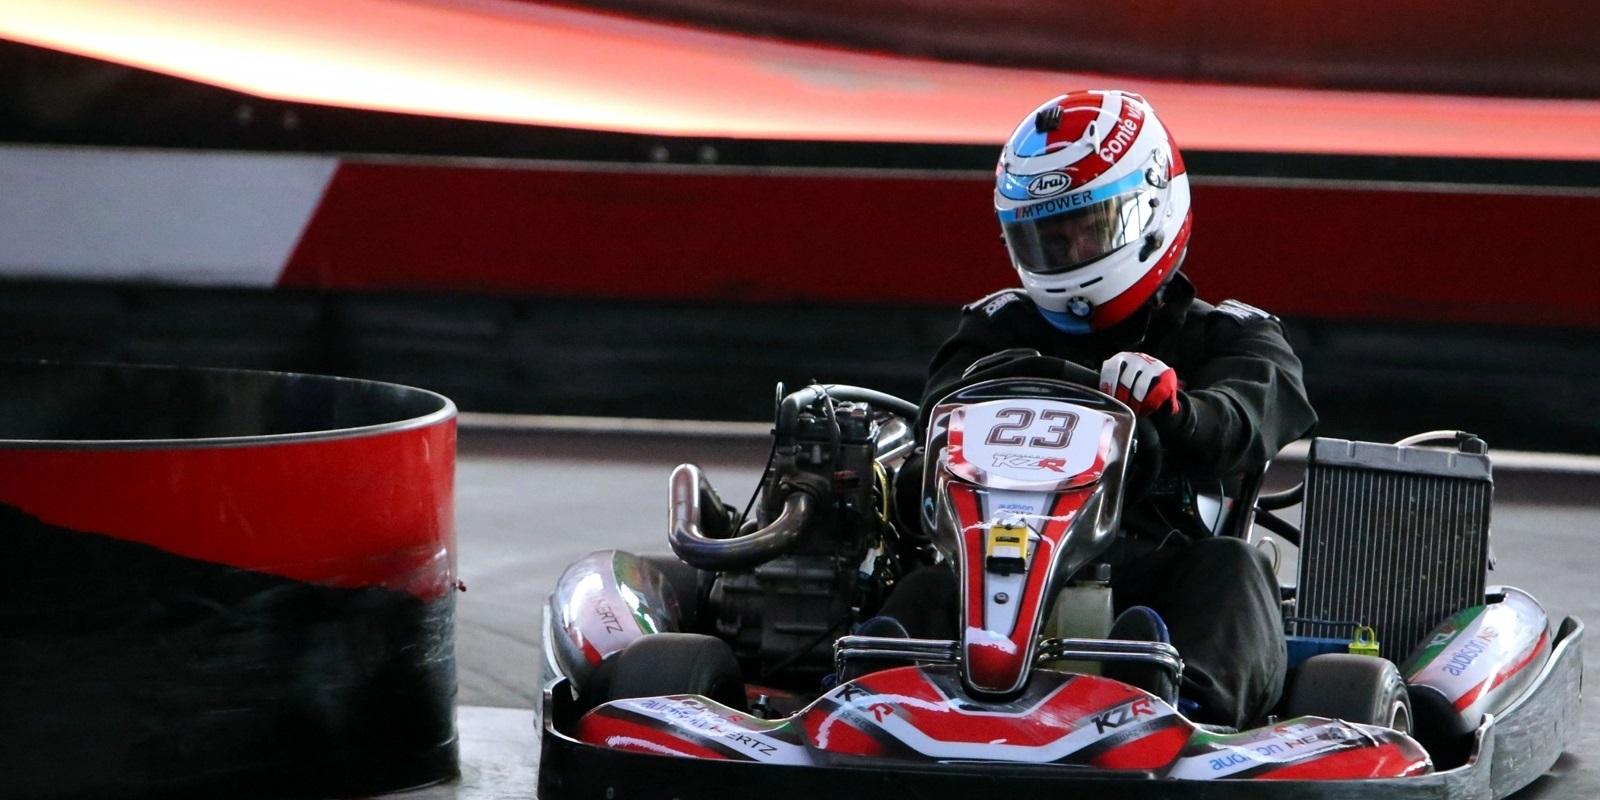 2015 – Kart World Championship